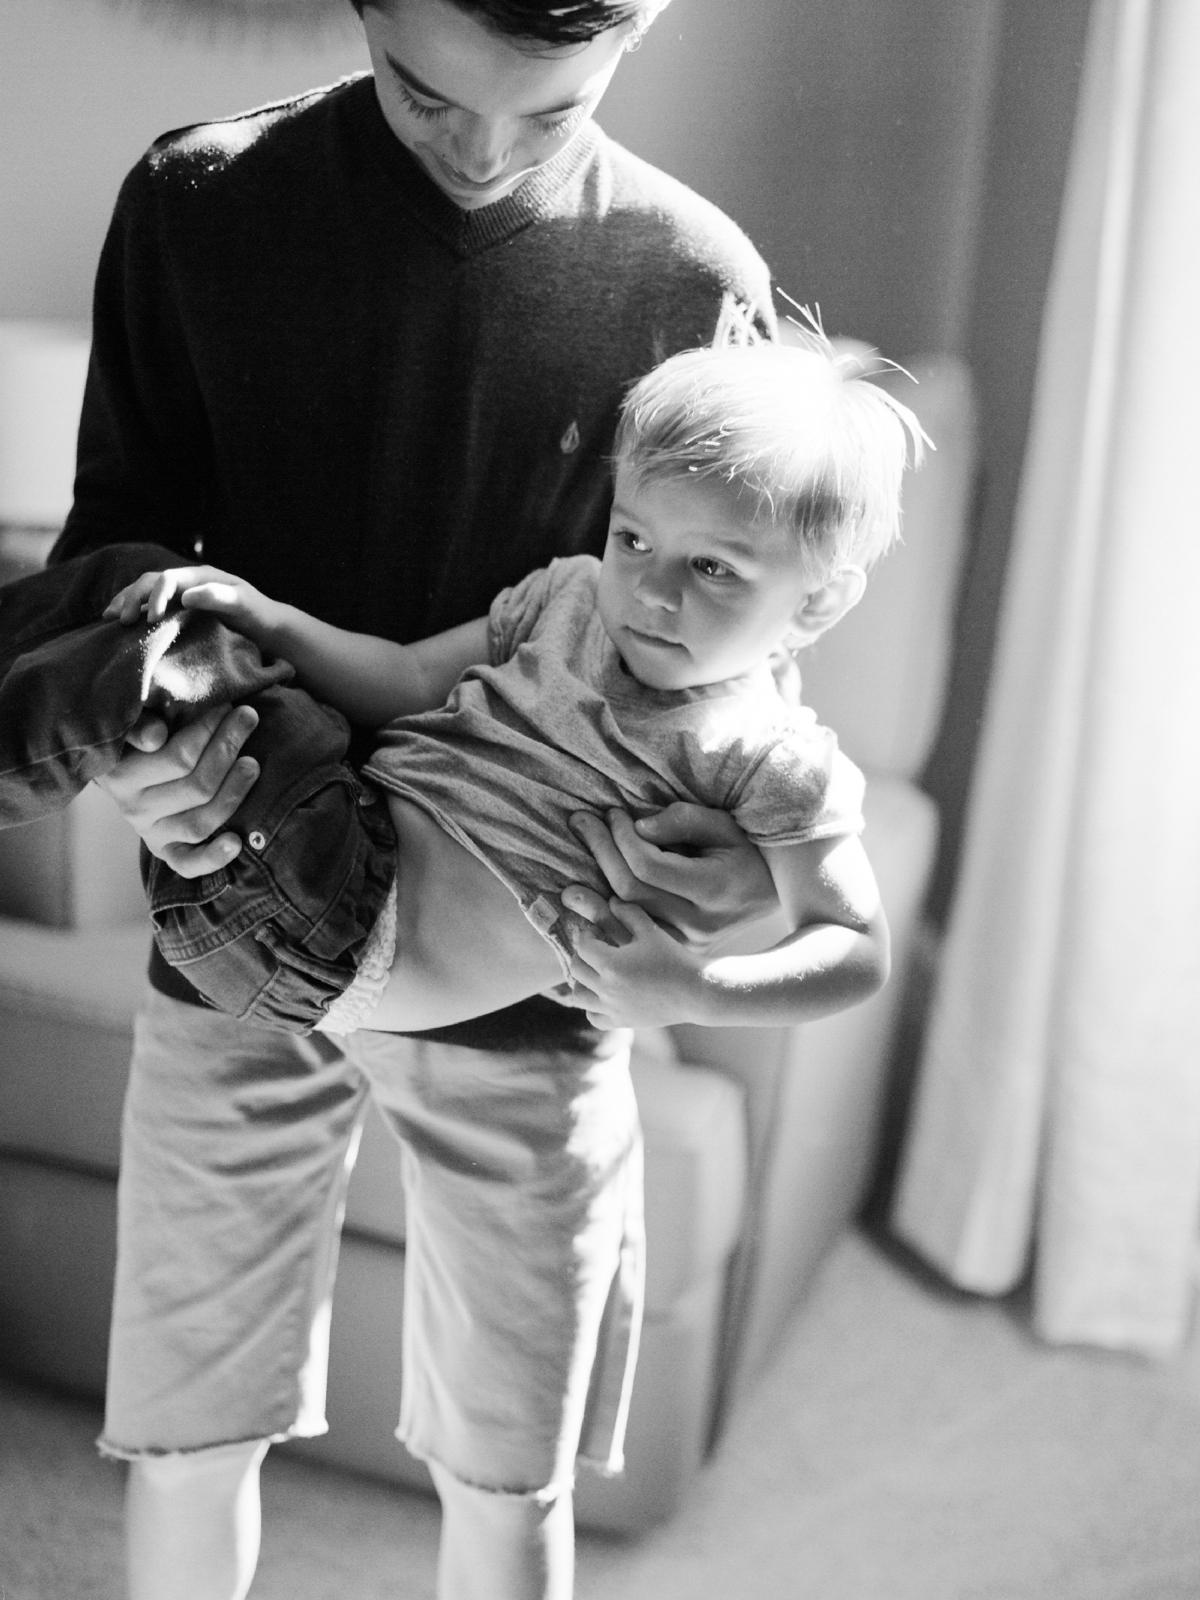 west palm beach family photographer - west palm beach - shannon griffin_0023.jpg